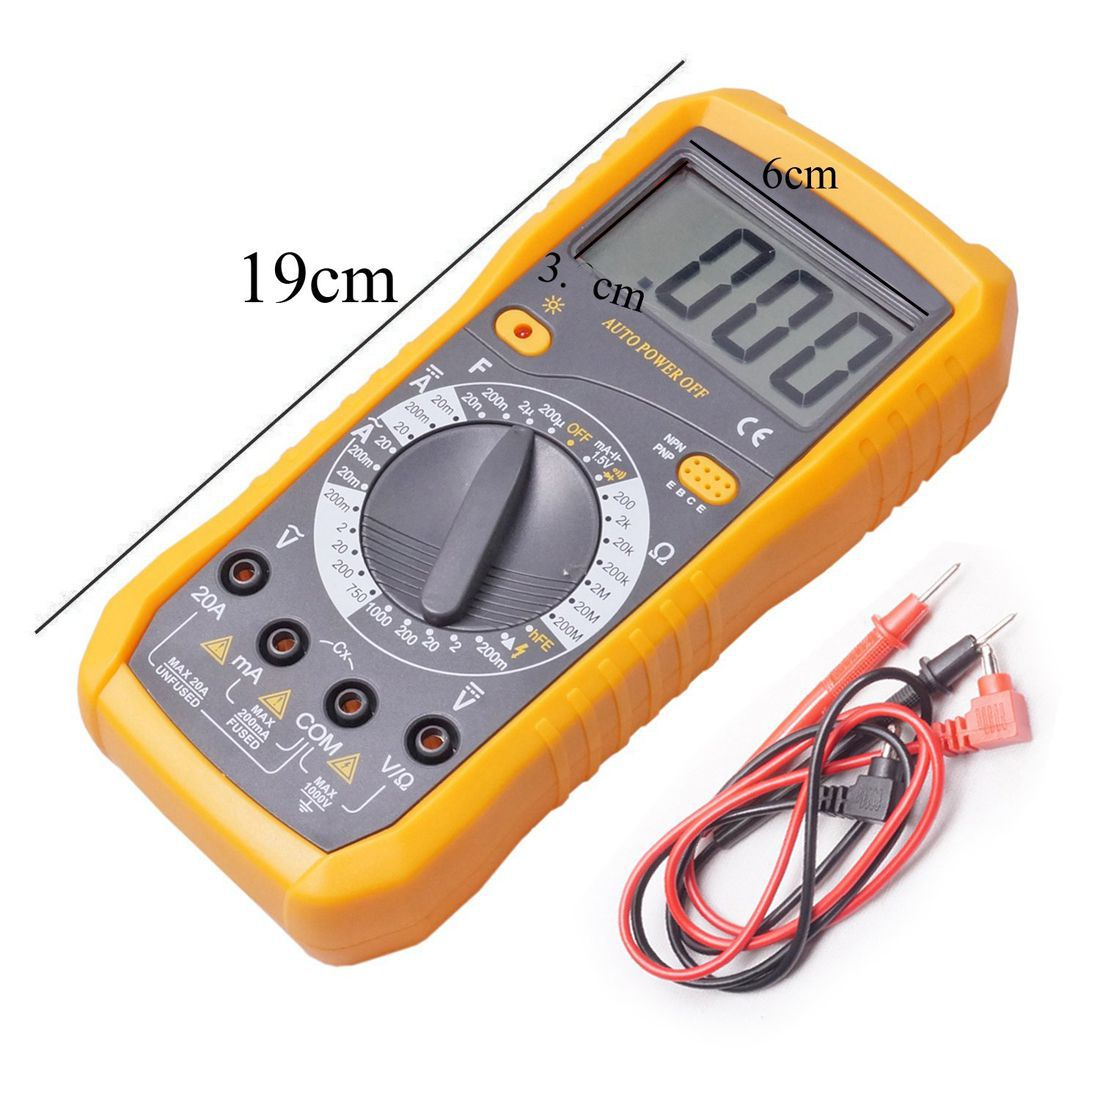 Buy Lcd Digital Voltmeter Ohmmeter Ammeter Ohm Multimeter Multi Test Circuit Tester Meter